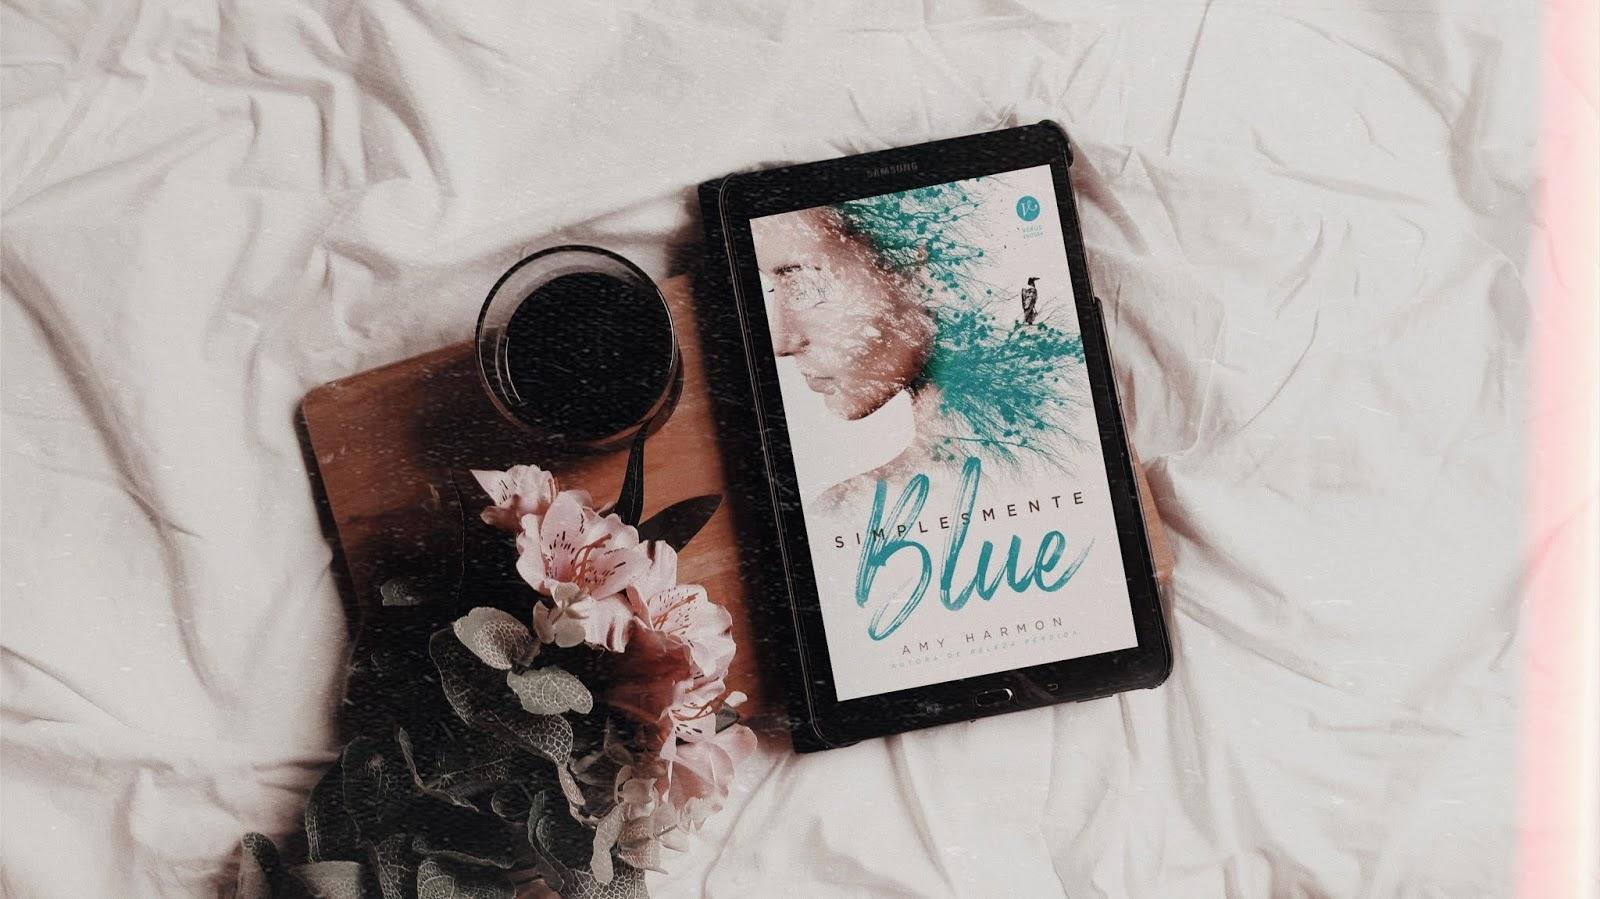 Simplesmente Blue - Amy Harmon | Resenha